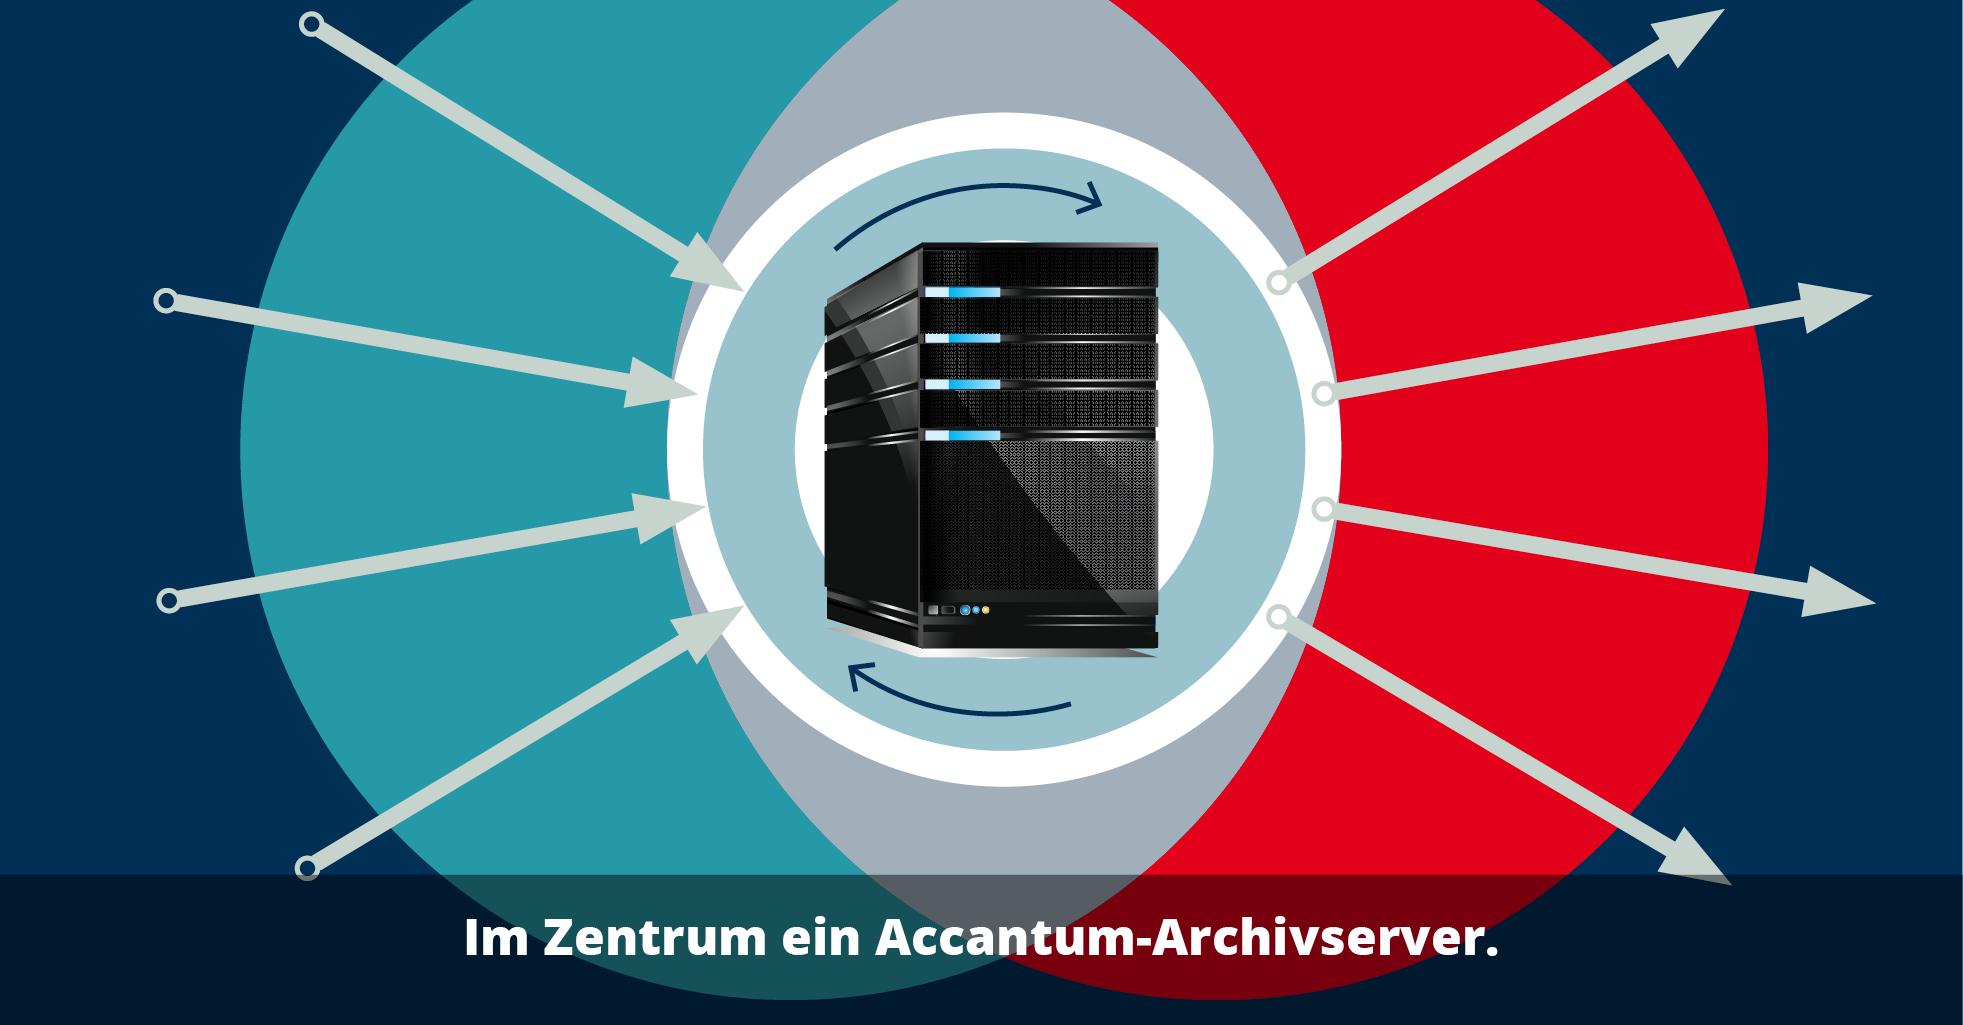 accantum-archivserver2